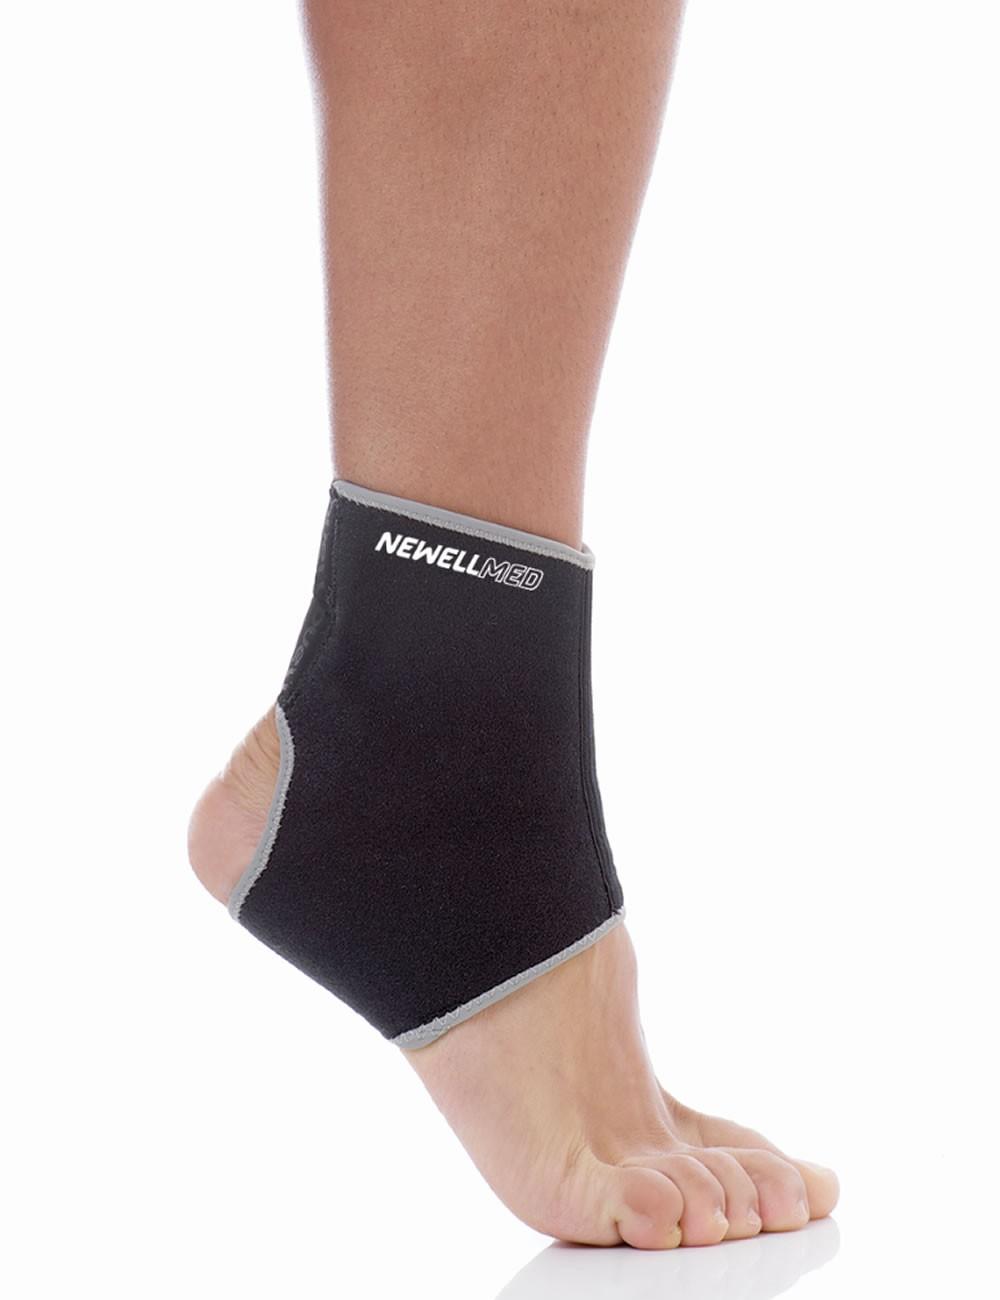 PK61 - Simple ankle brace